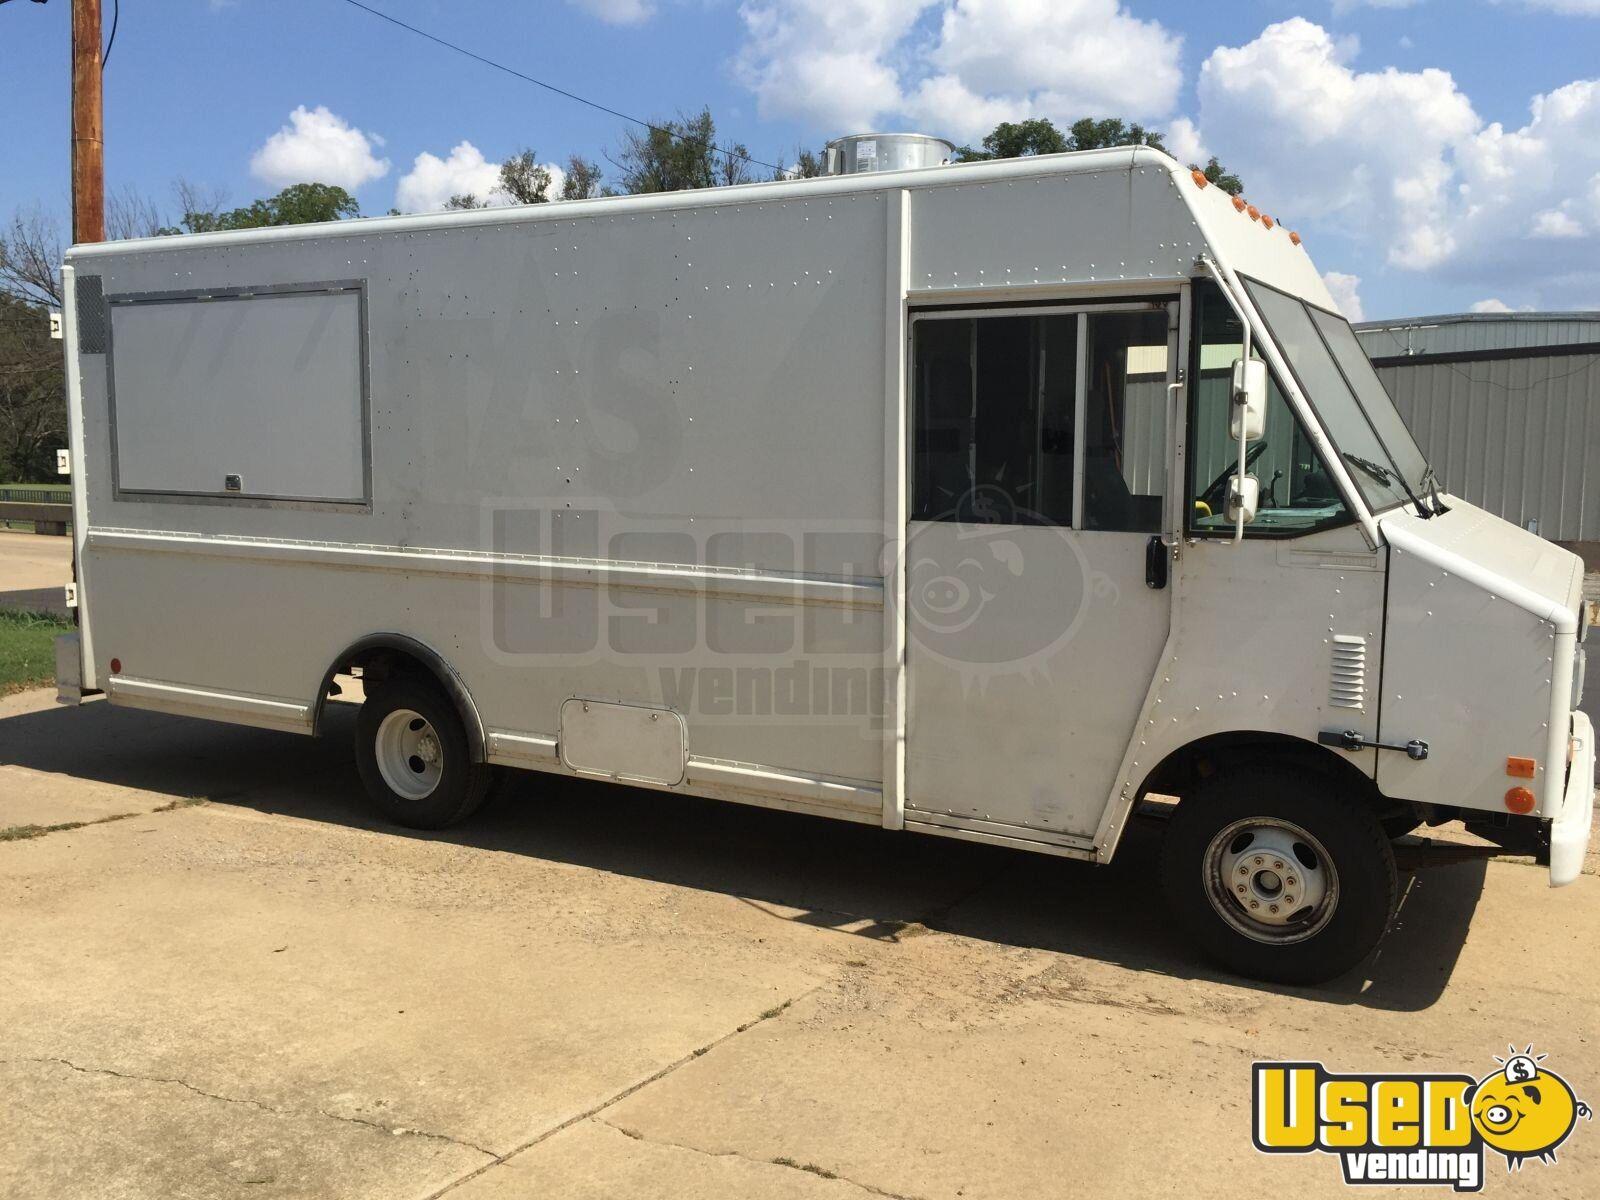 16 39 mobile kitchen truck used food truck for sale in missouri. Black Bedroom Furniture Sets. Home Design Ideas